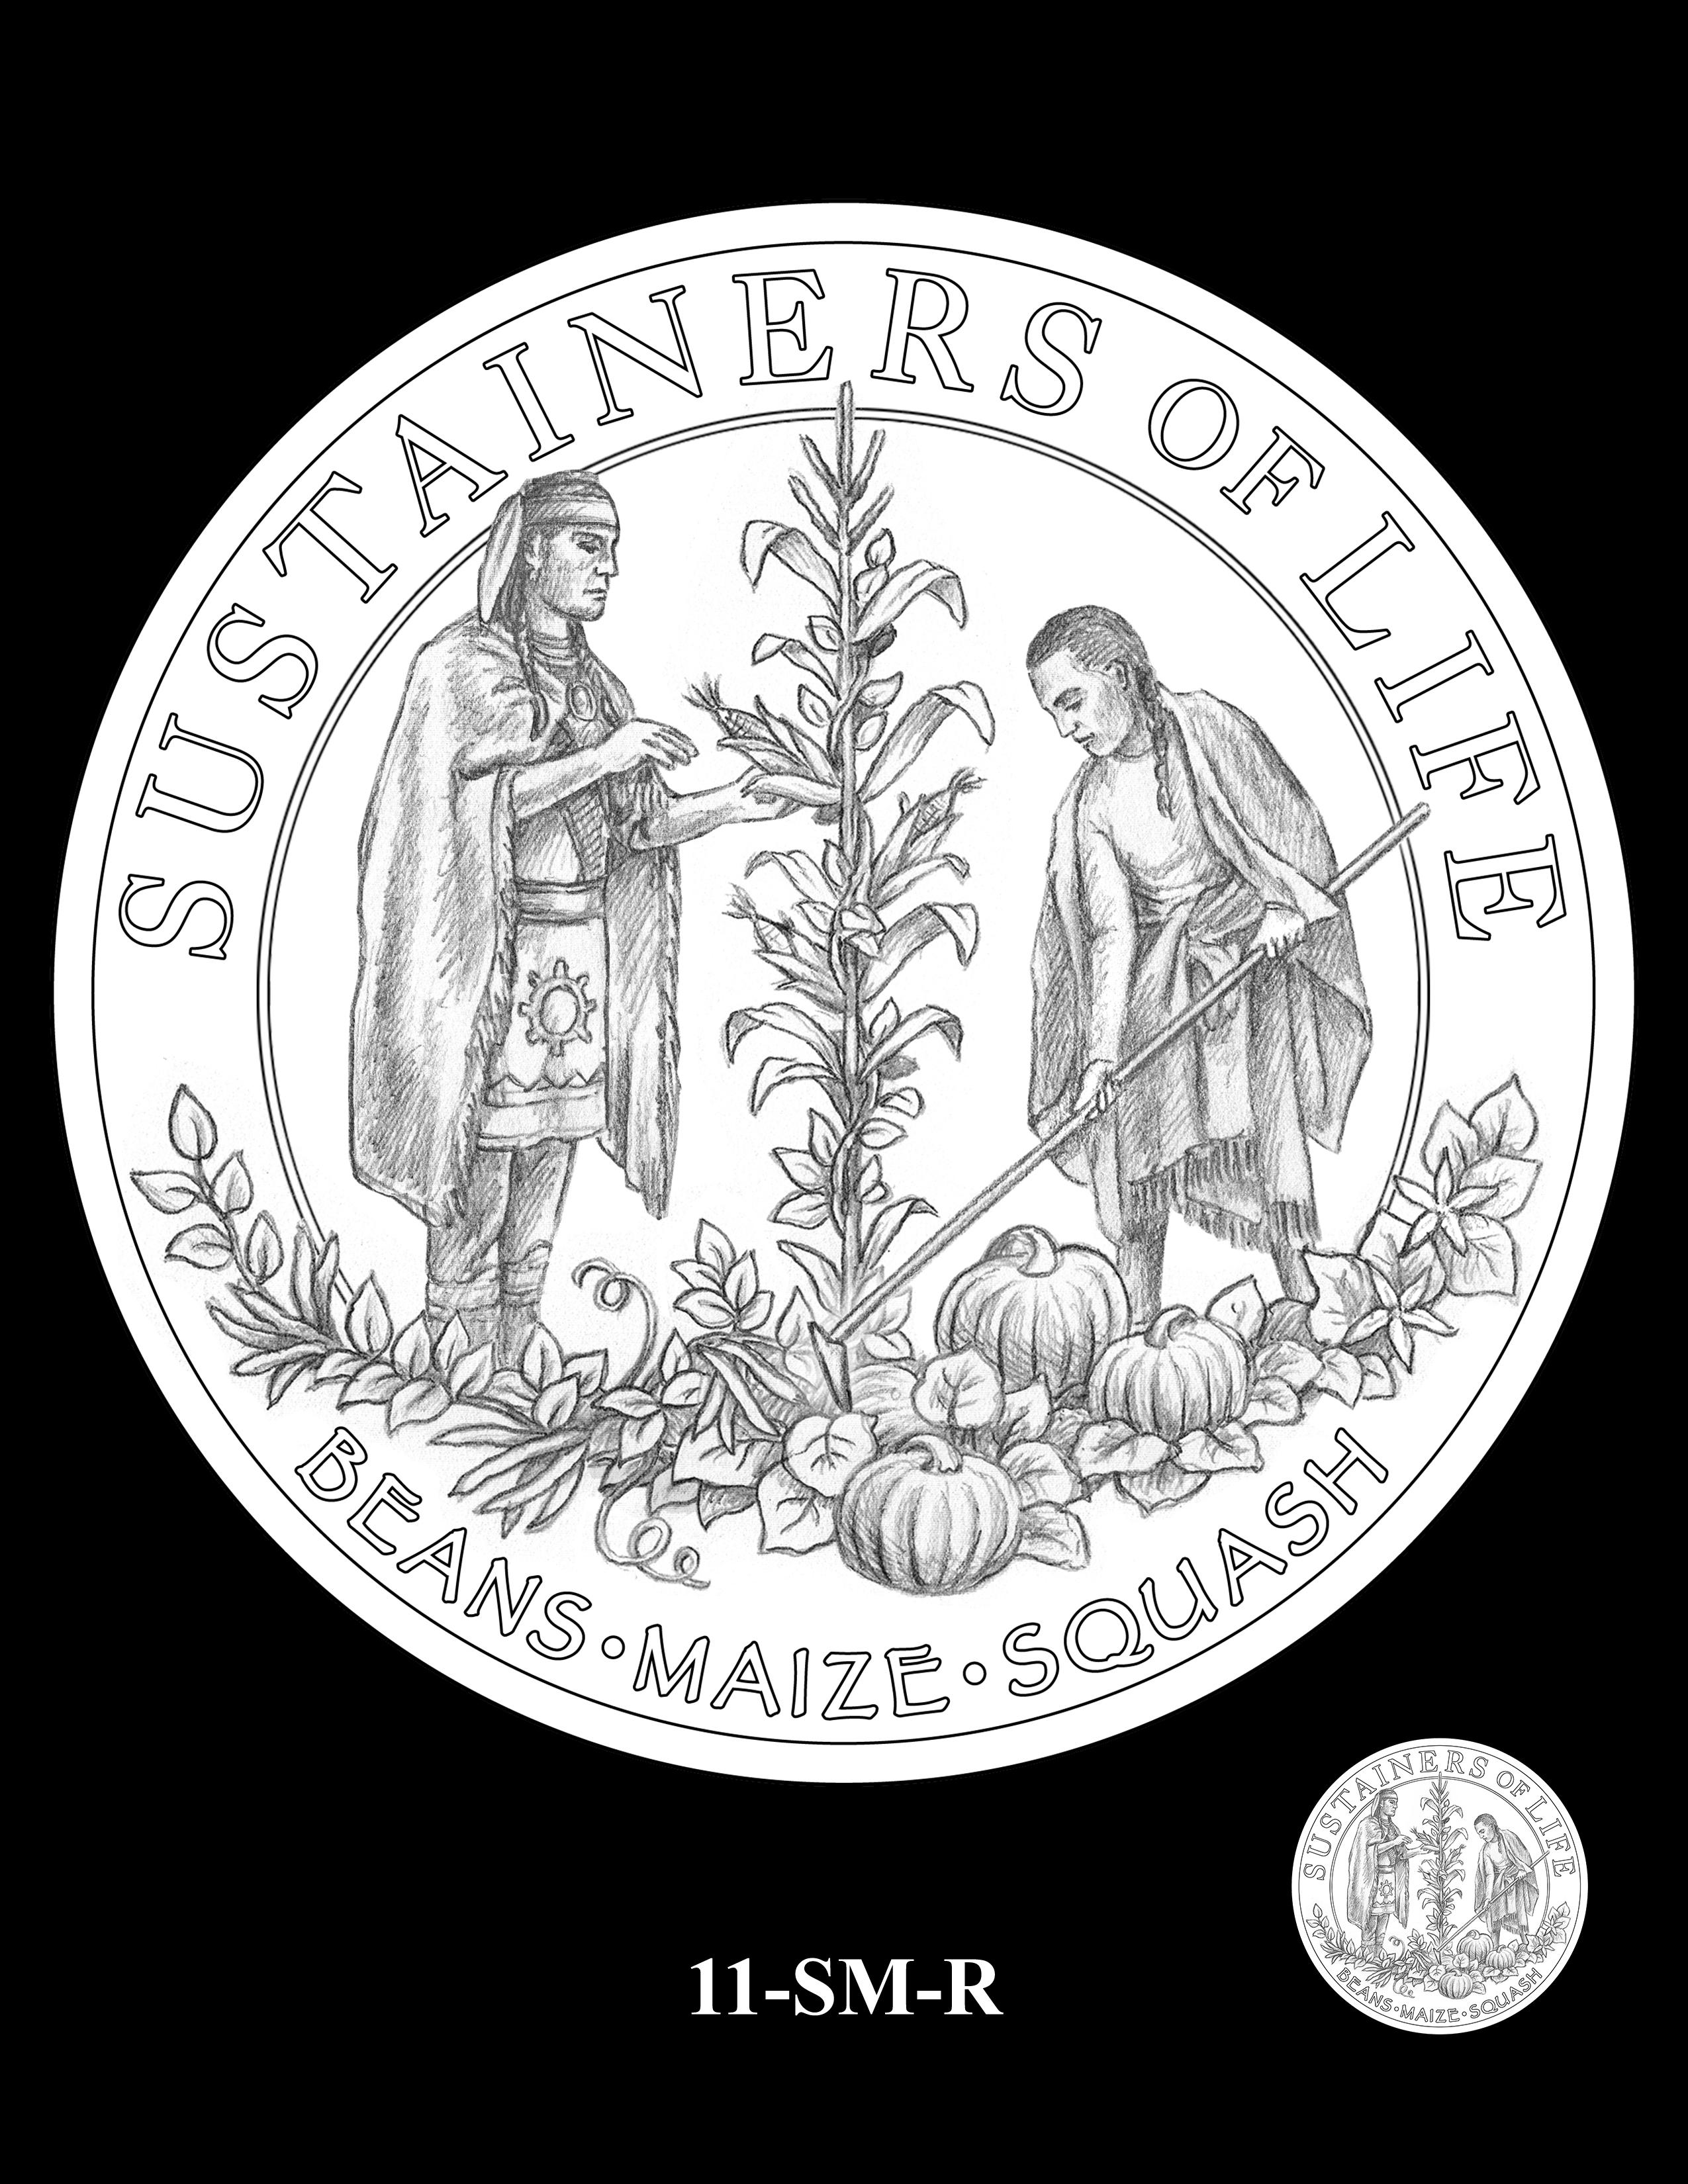 11-SM-R - 2020 Mayflower 400th Anniversary 24K Gold Coin & Silver Medal Program